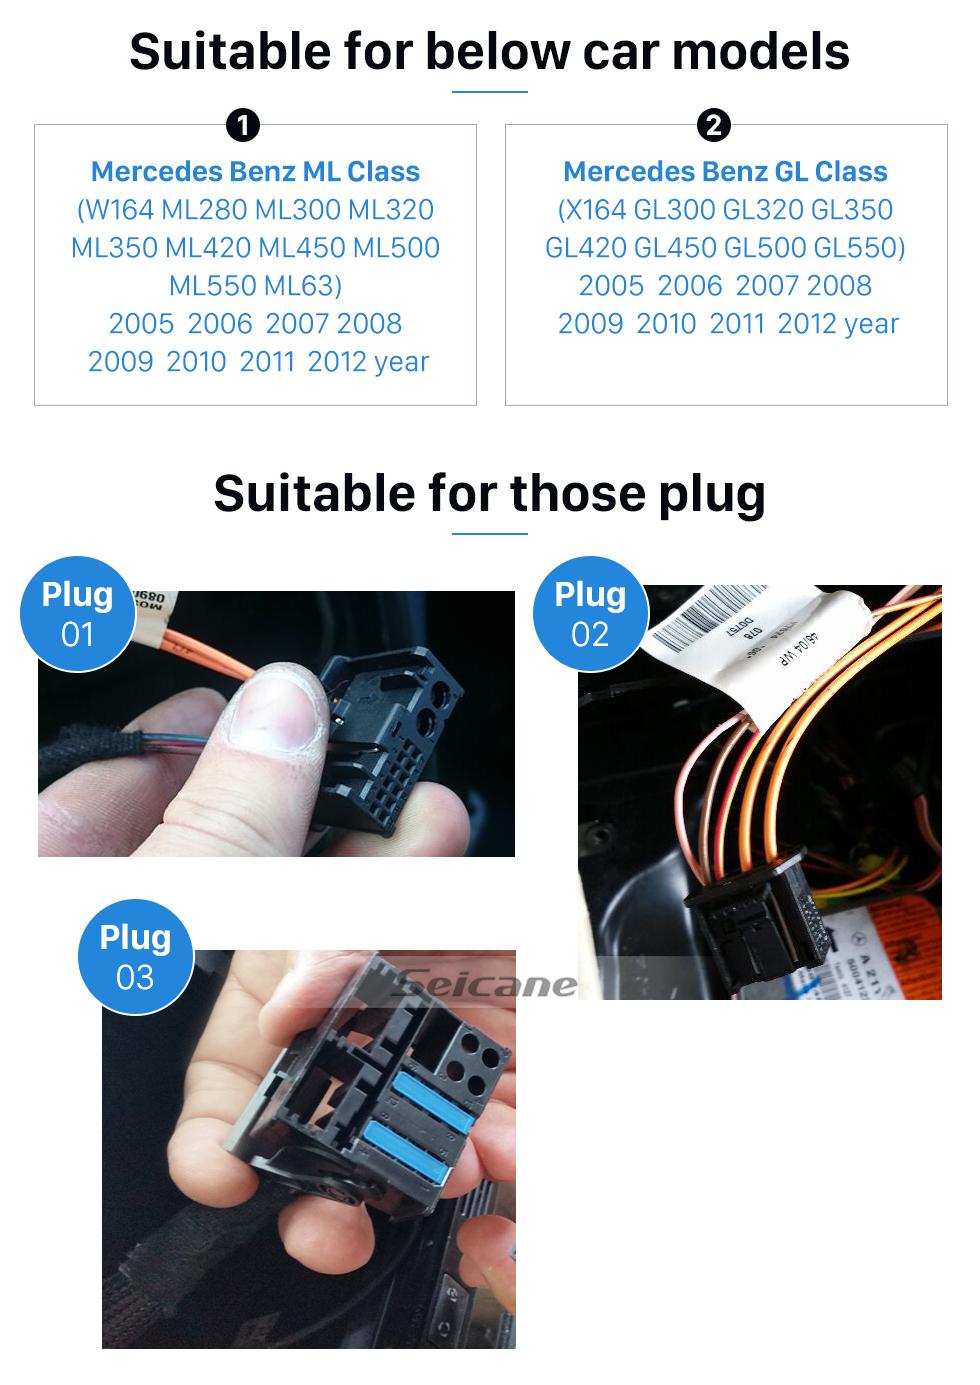 Seicane 2005-2012 Mercedes Benz ML Class W164 ML280 ML300 ML320 ML350 ML420 ML450 ML500 ML550 ML63 Car Optical Fiber Decoder Most Box Bose Harmon Kardon Converter Optic Interface